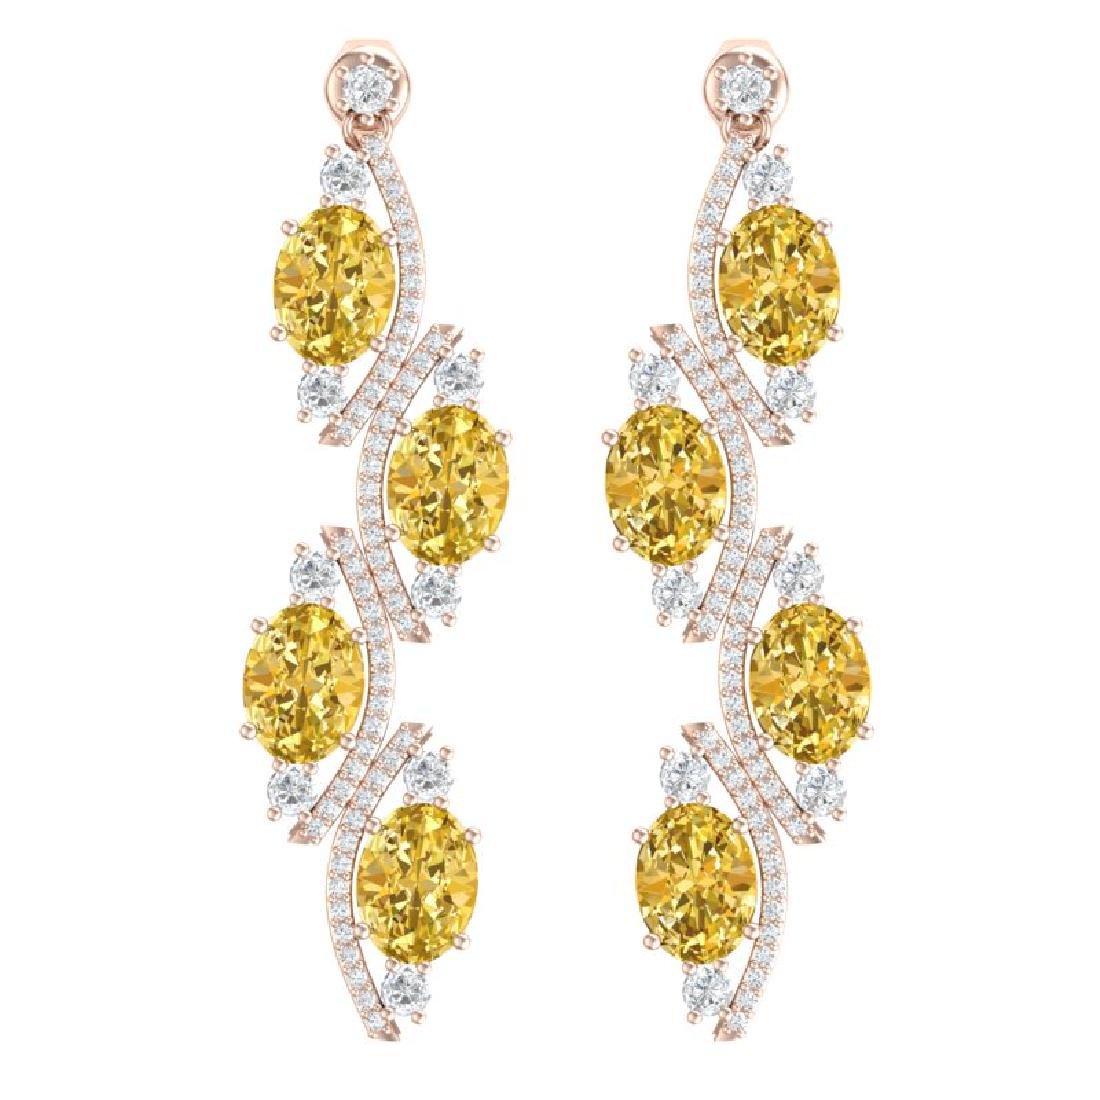 13.32 CTW Royalty Canary Citrine & VS Diamond Earrings